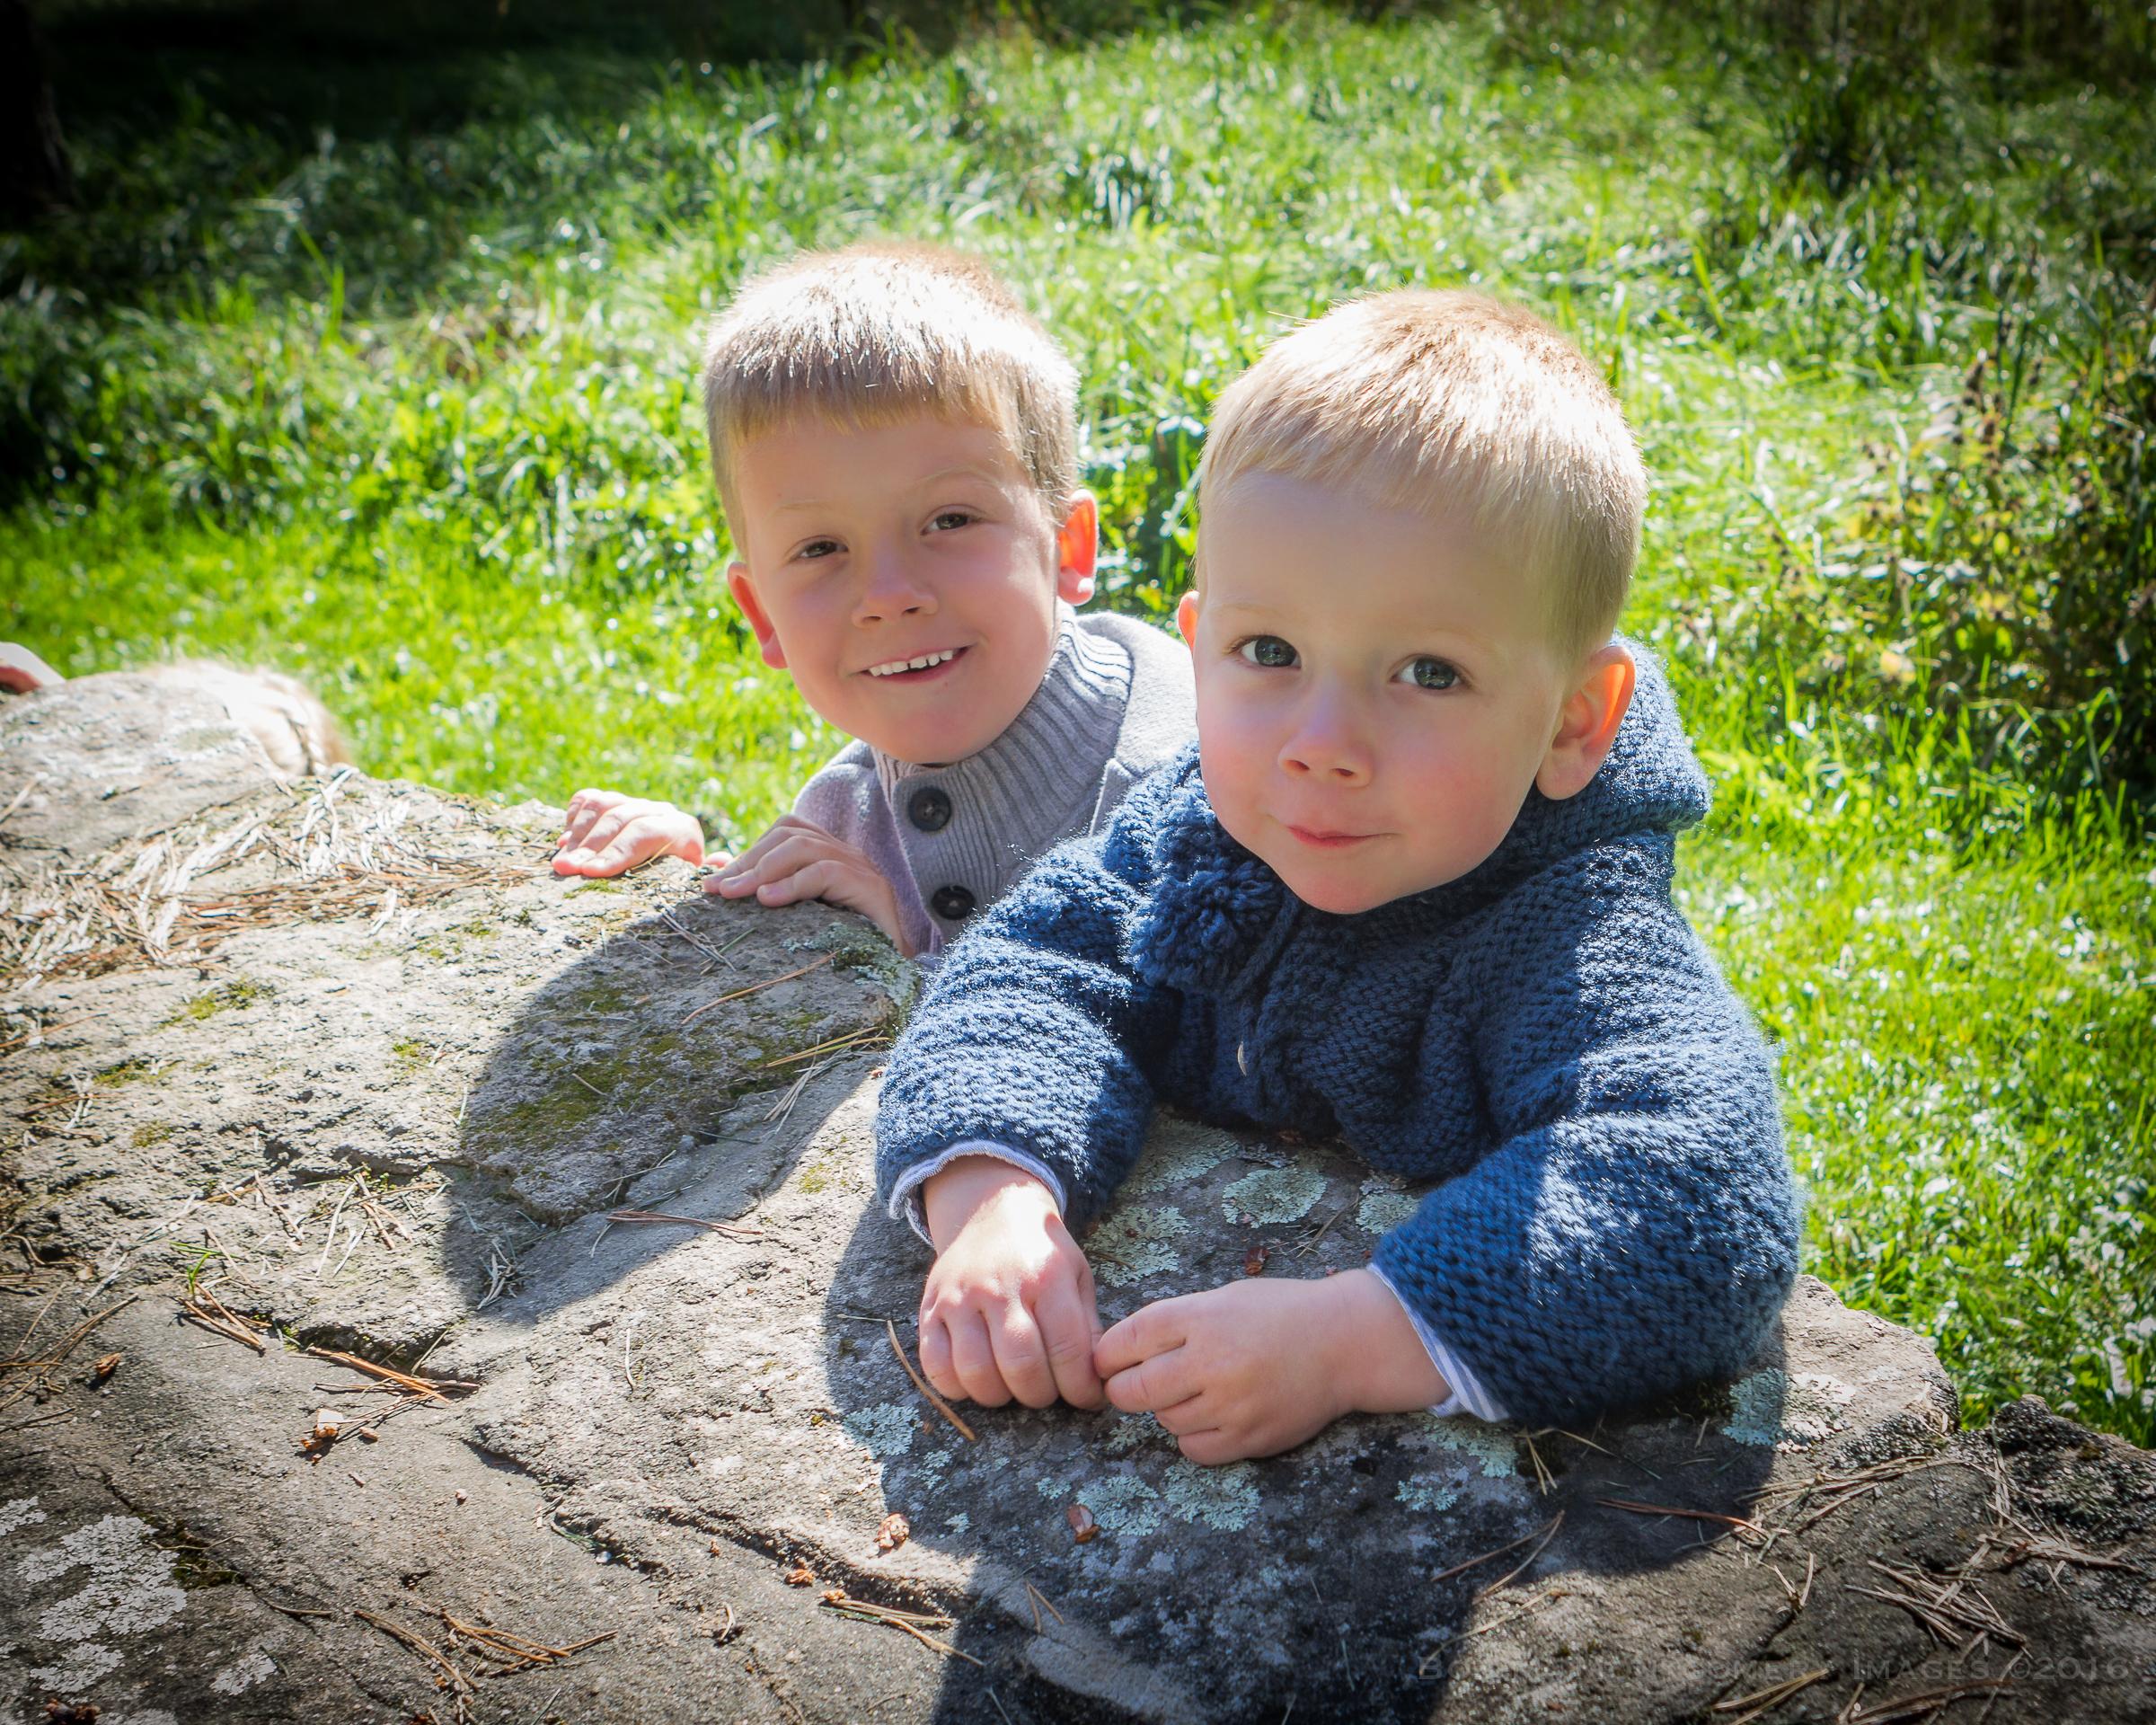 Emery kids group 20160925 - 0002.jpg